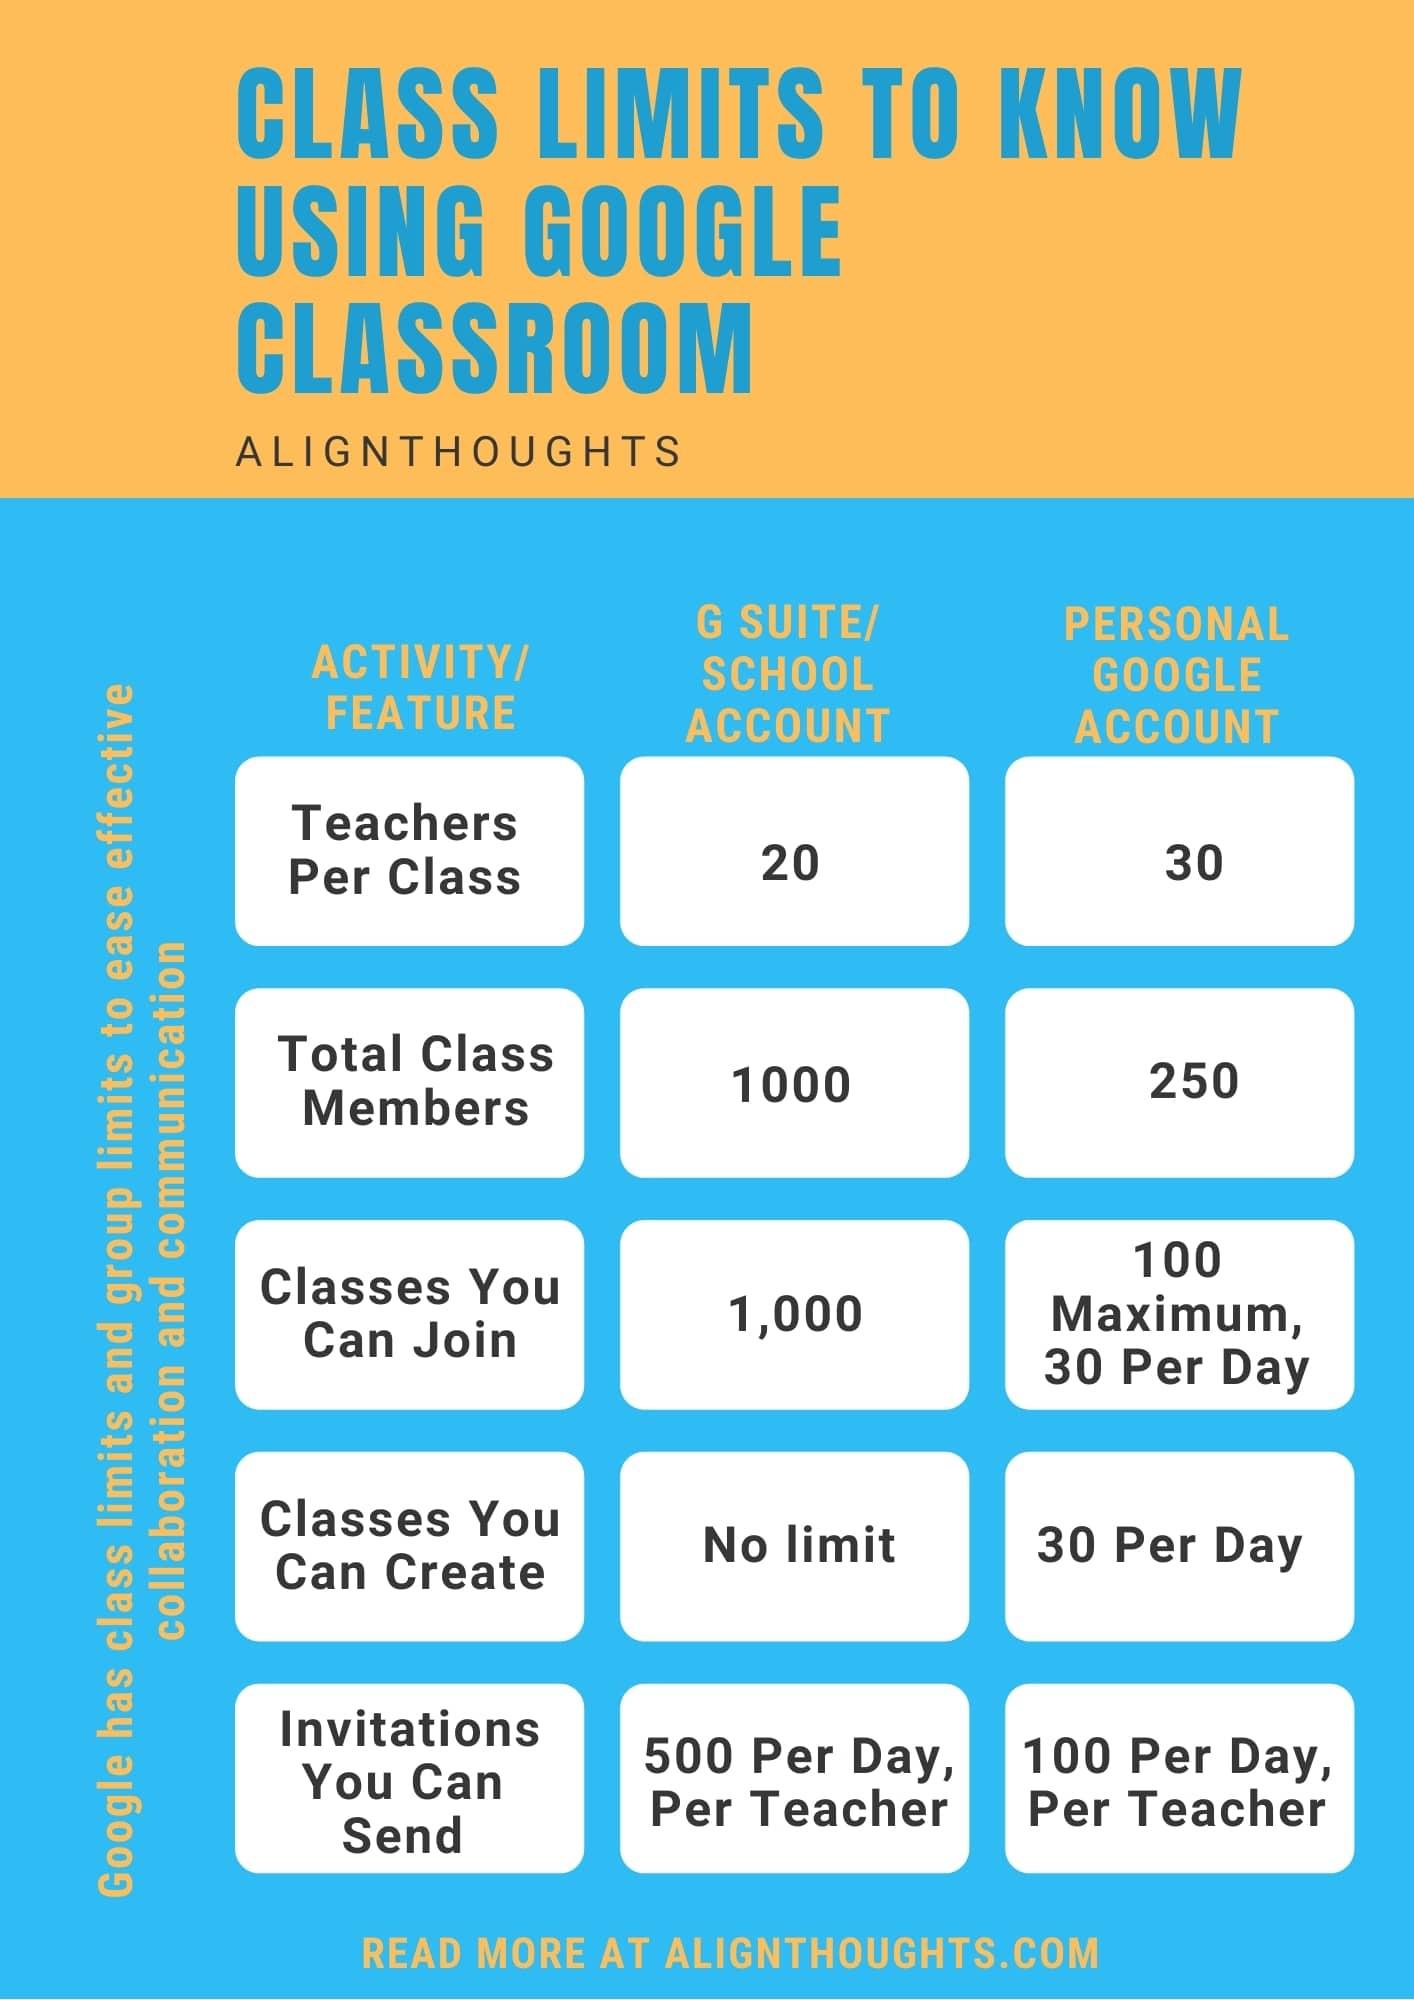 Class Limits when using GoogleClassroom